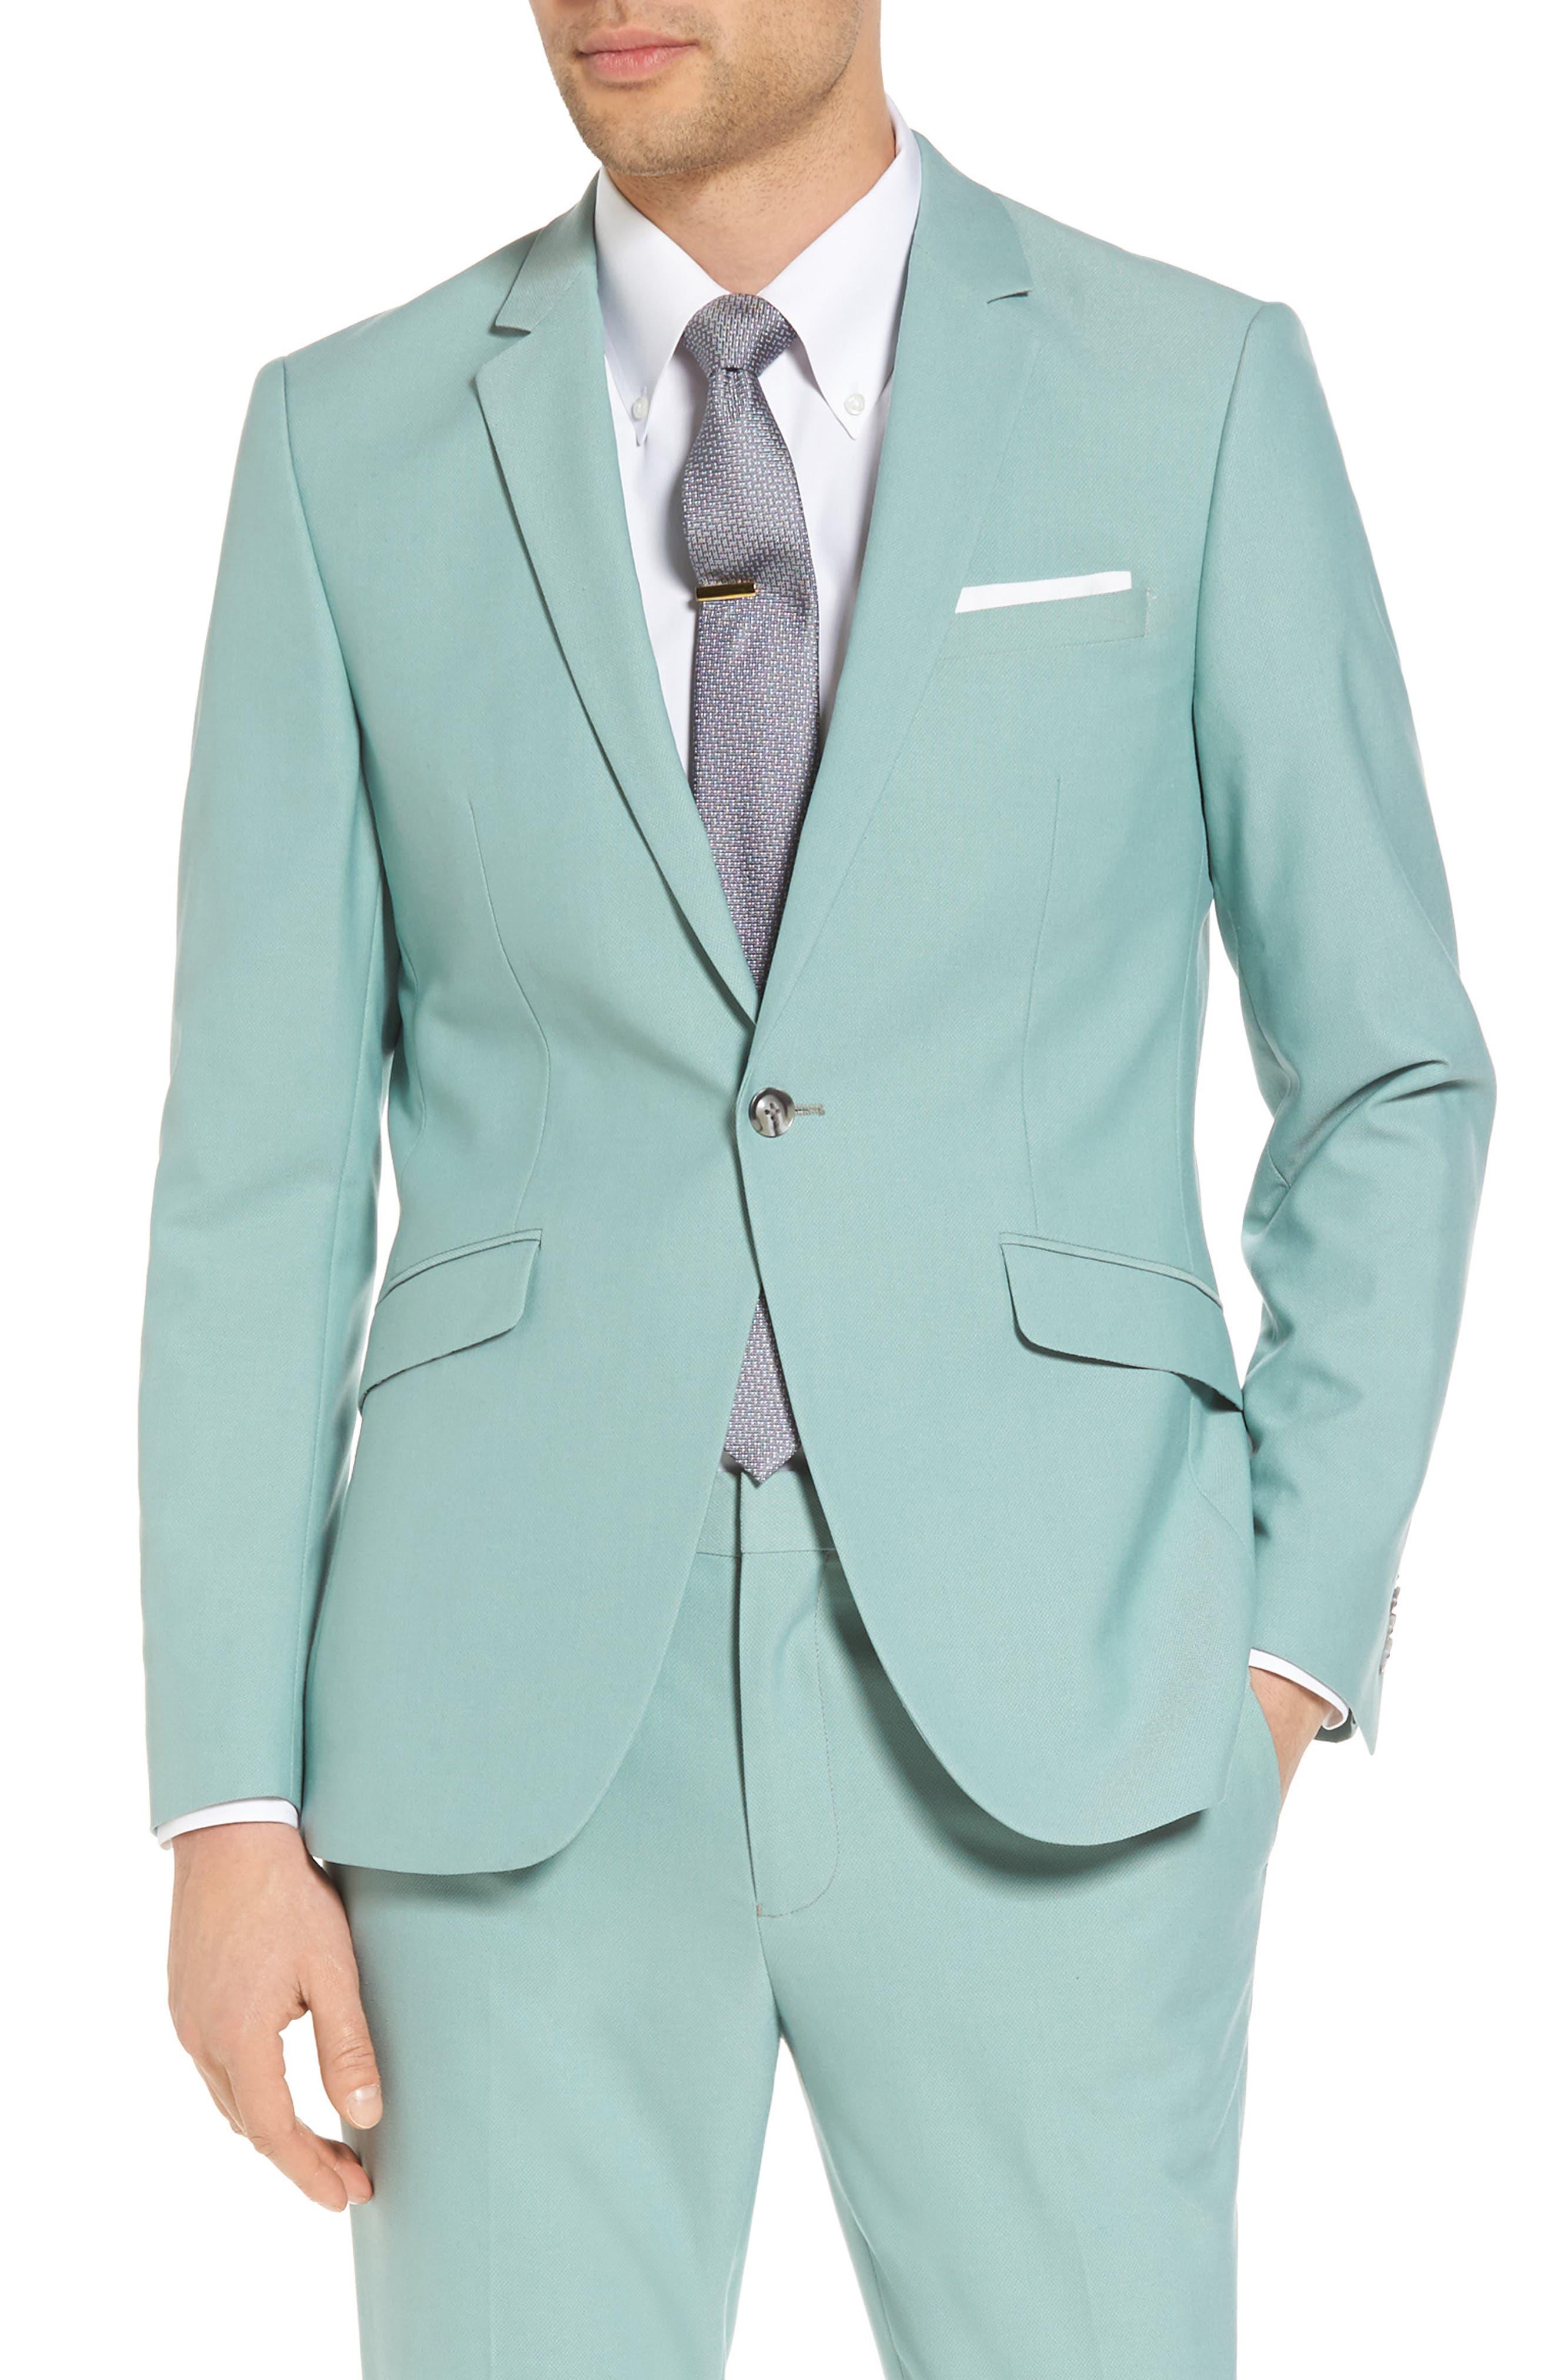 Skinny Fit Suit Jacket,                             Main thumbnail 1, color,                             300